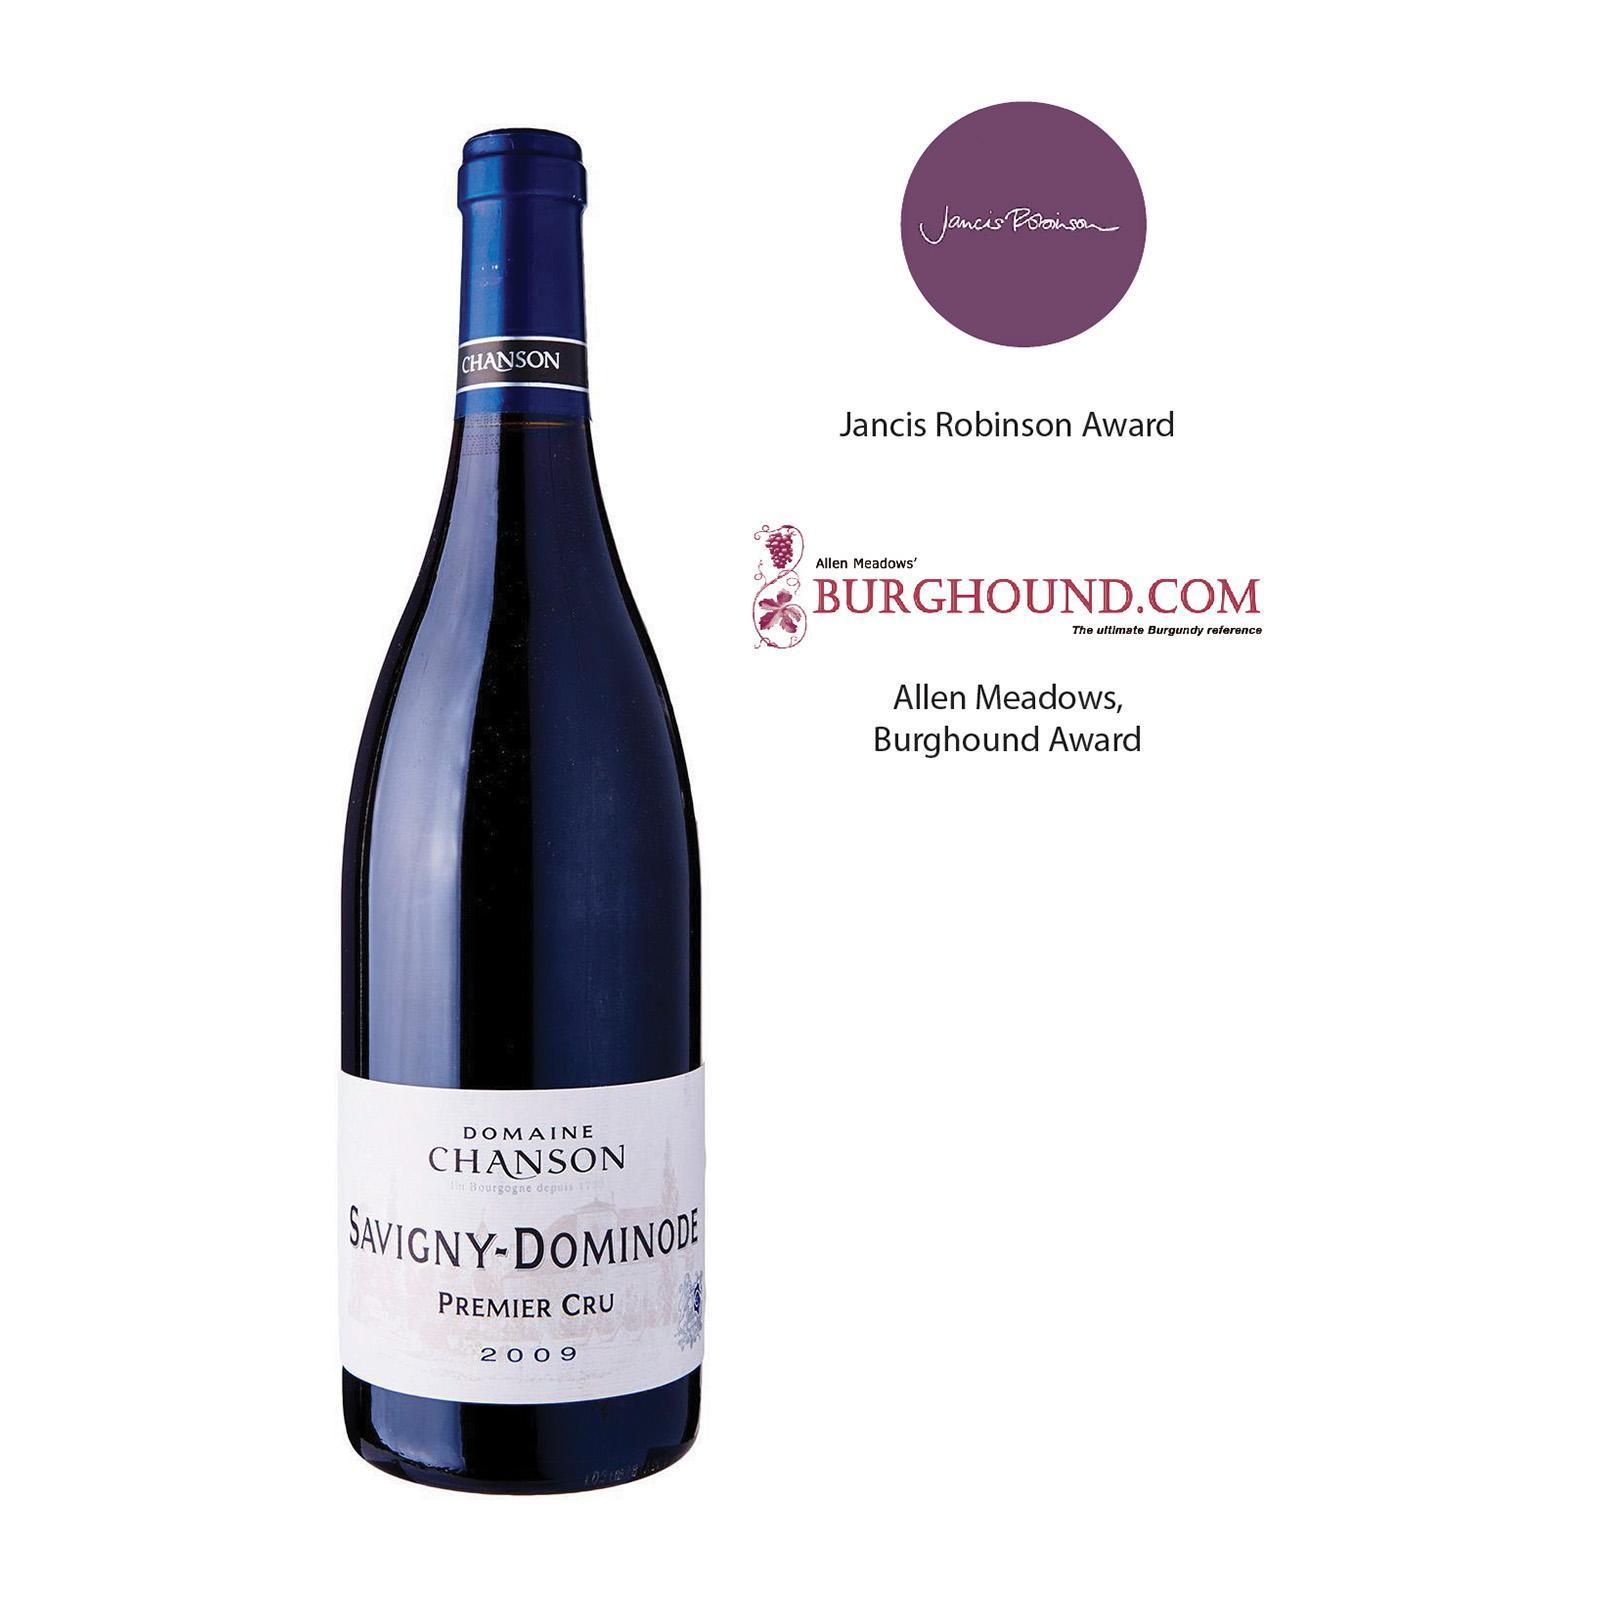 Domaine Chanson Savigny-Dominode 1er Cru - The Cellar Door